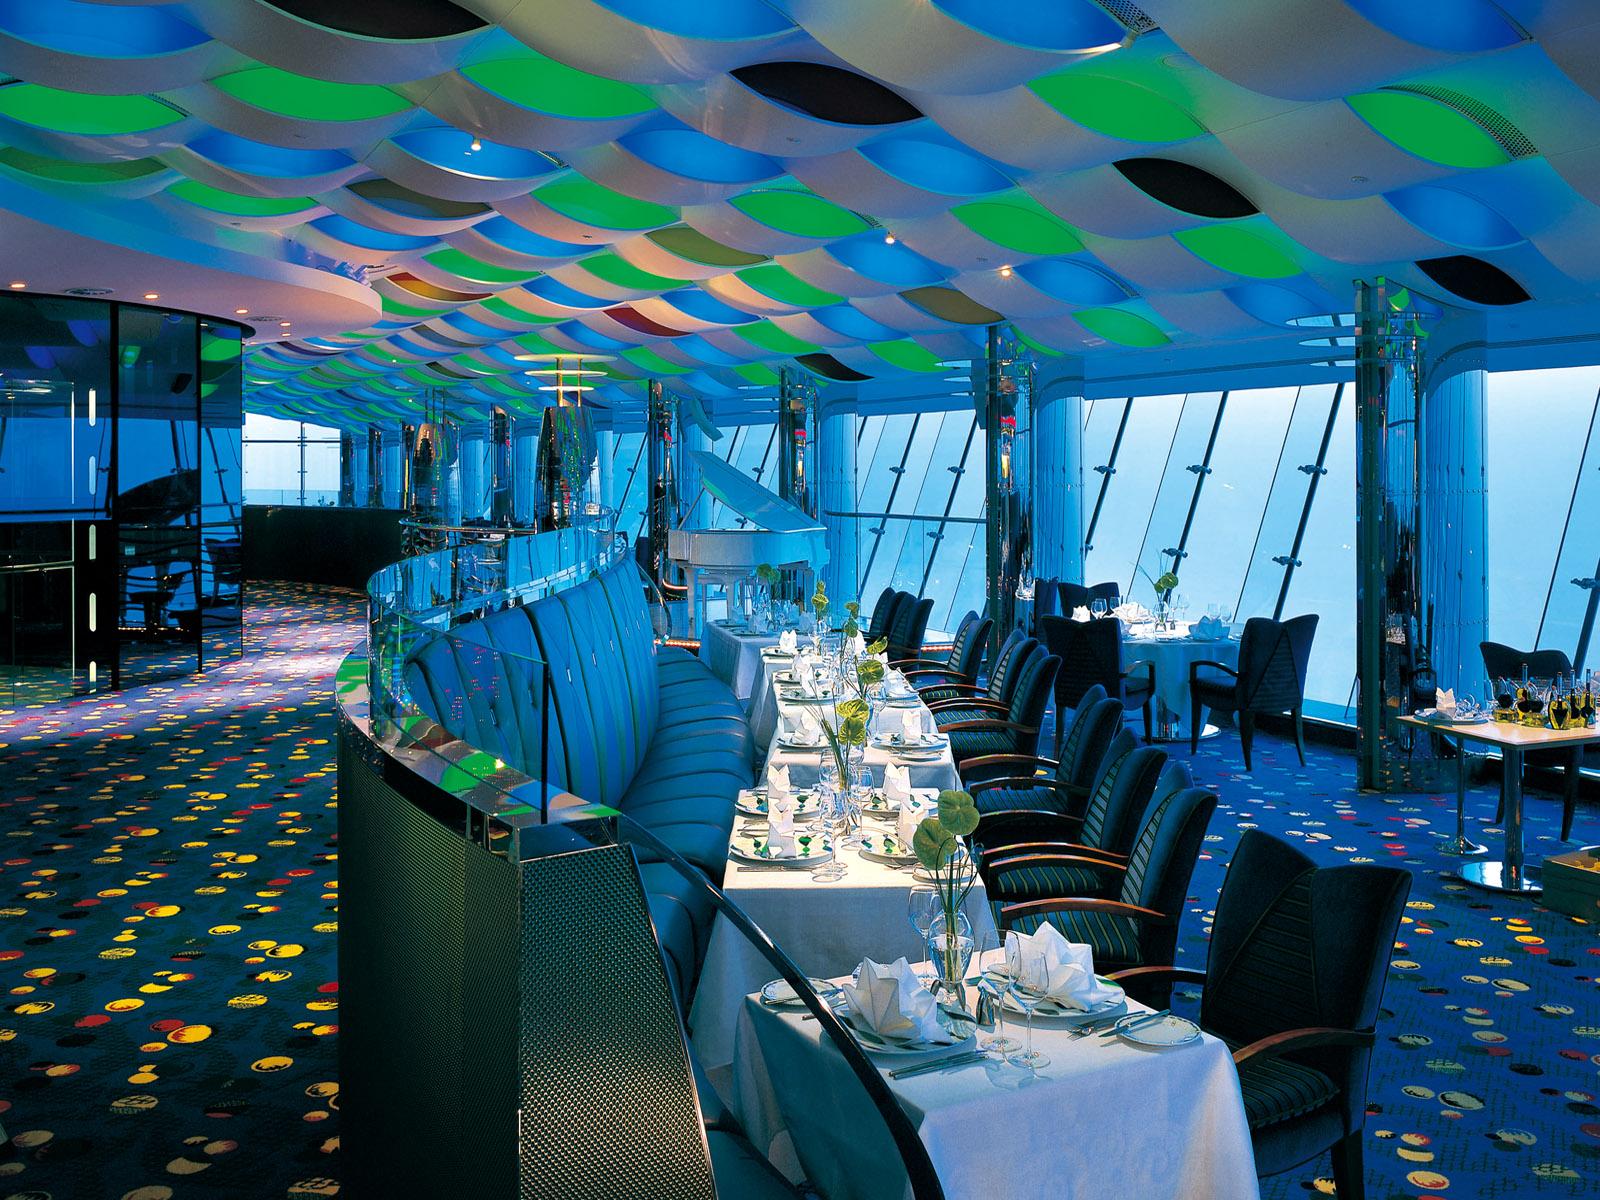 blue-green-hotel-interior blue green hotel interior